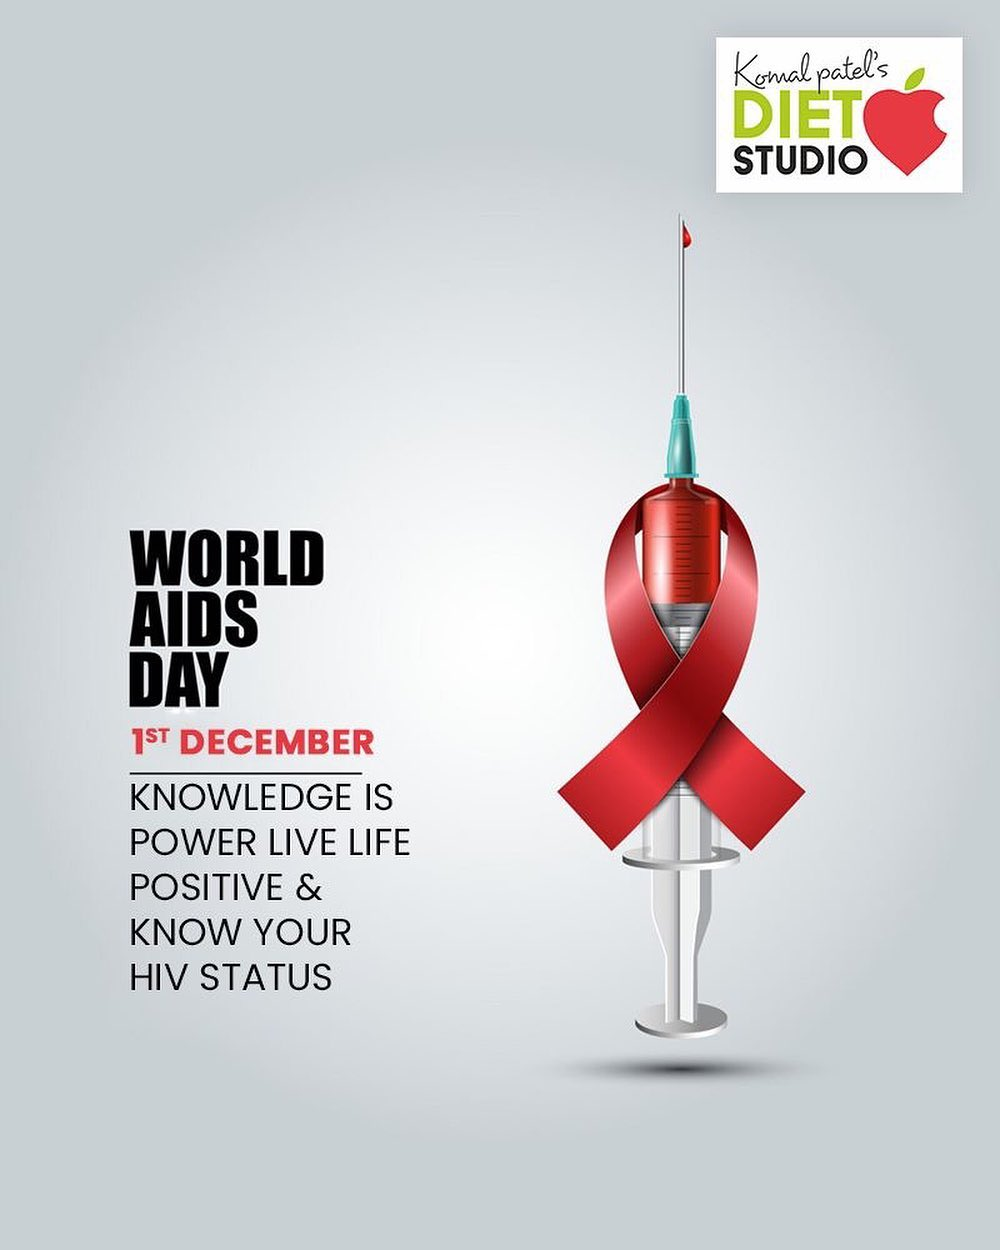 Knowledge is power Live life positive & know your HIV status.  #WorldAIDSDay #AIDSDay #AIDSDay2019 #WorldAIDSDay2019 #komalpatel #diet #goodfood #eathealthy #goodhealth